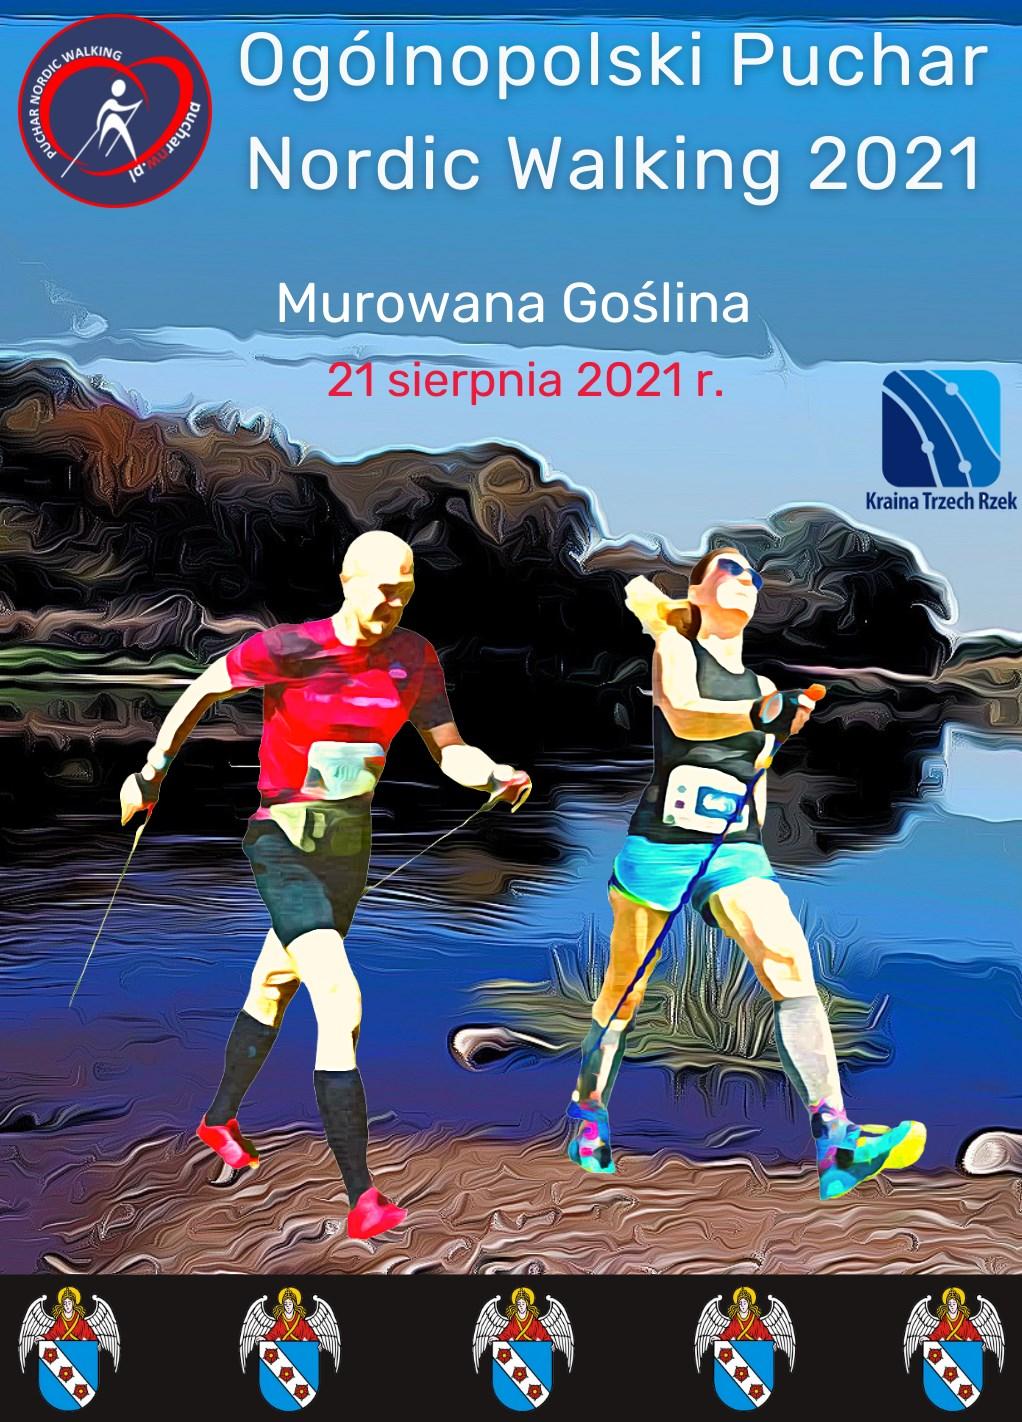 plakat ogólnopolski puchar nordic walking murowana goślina